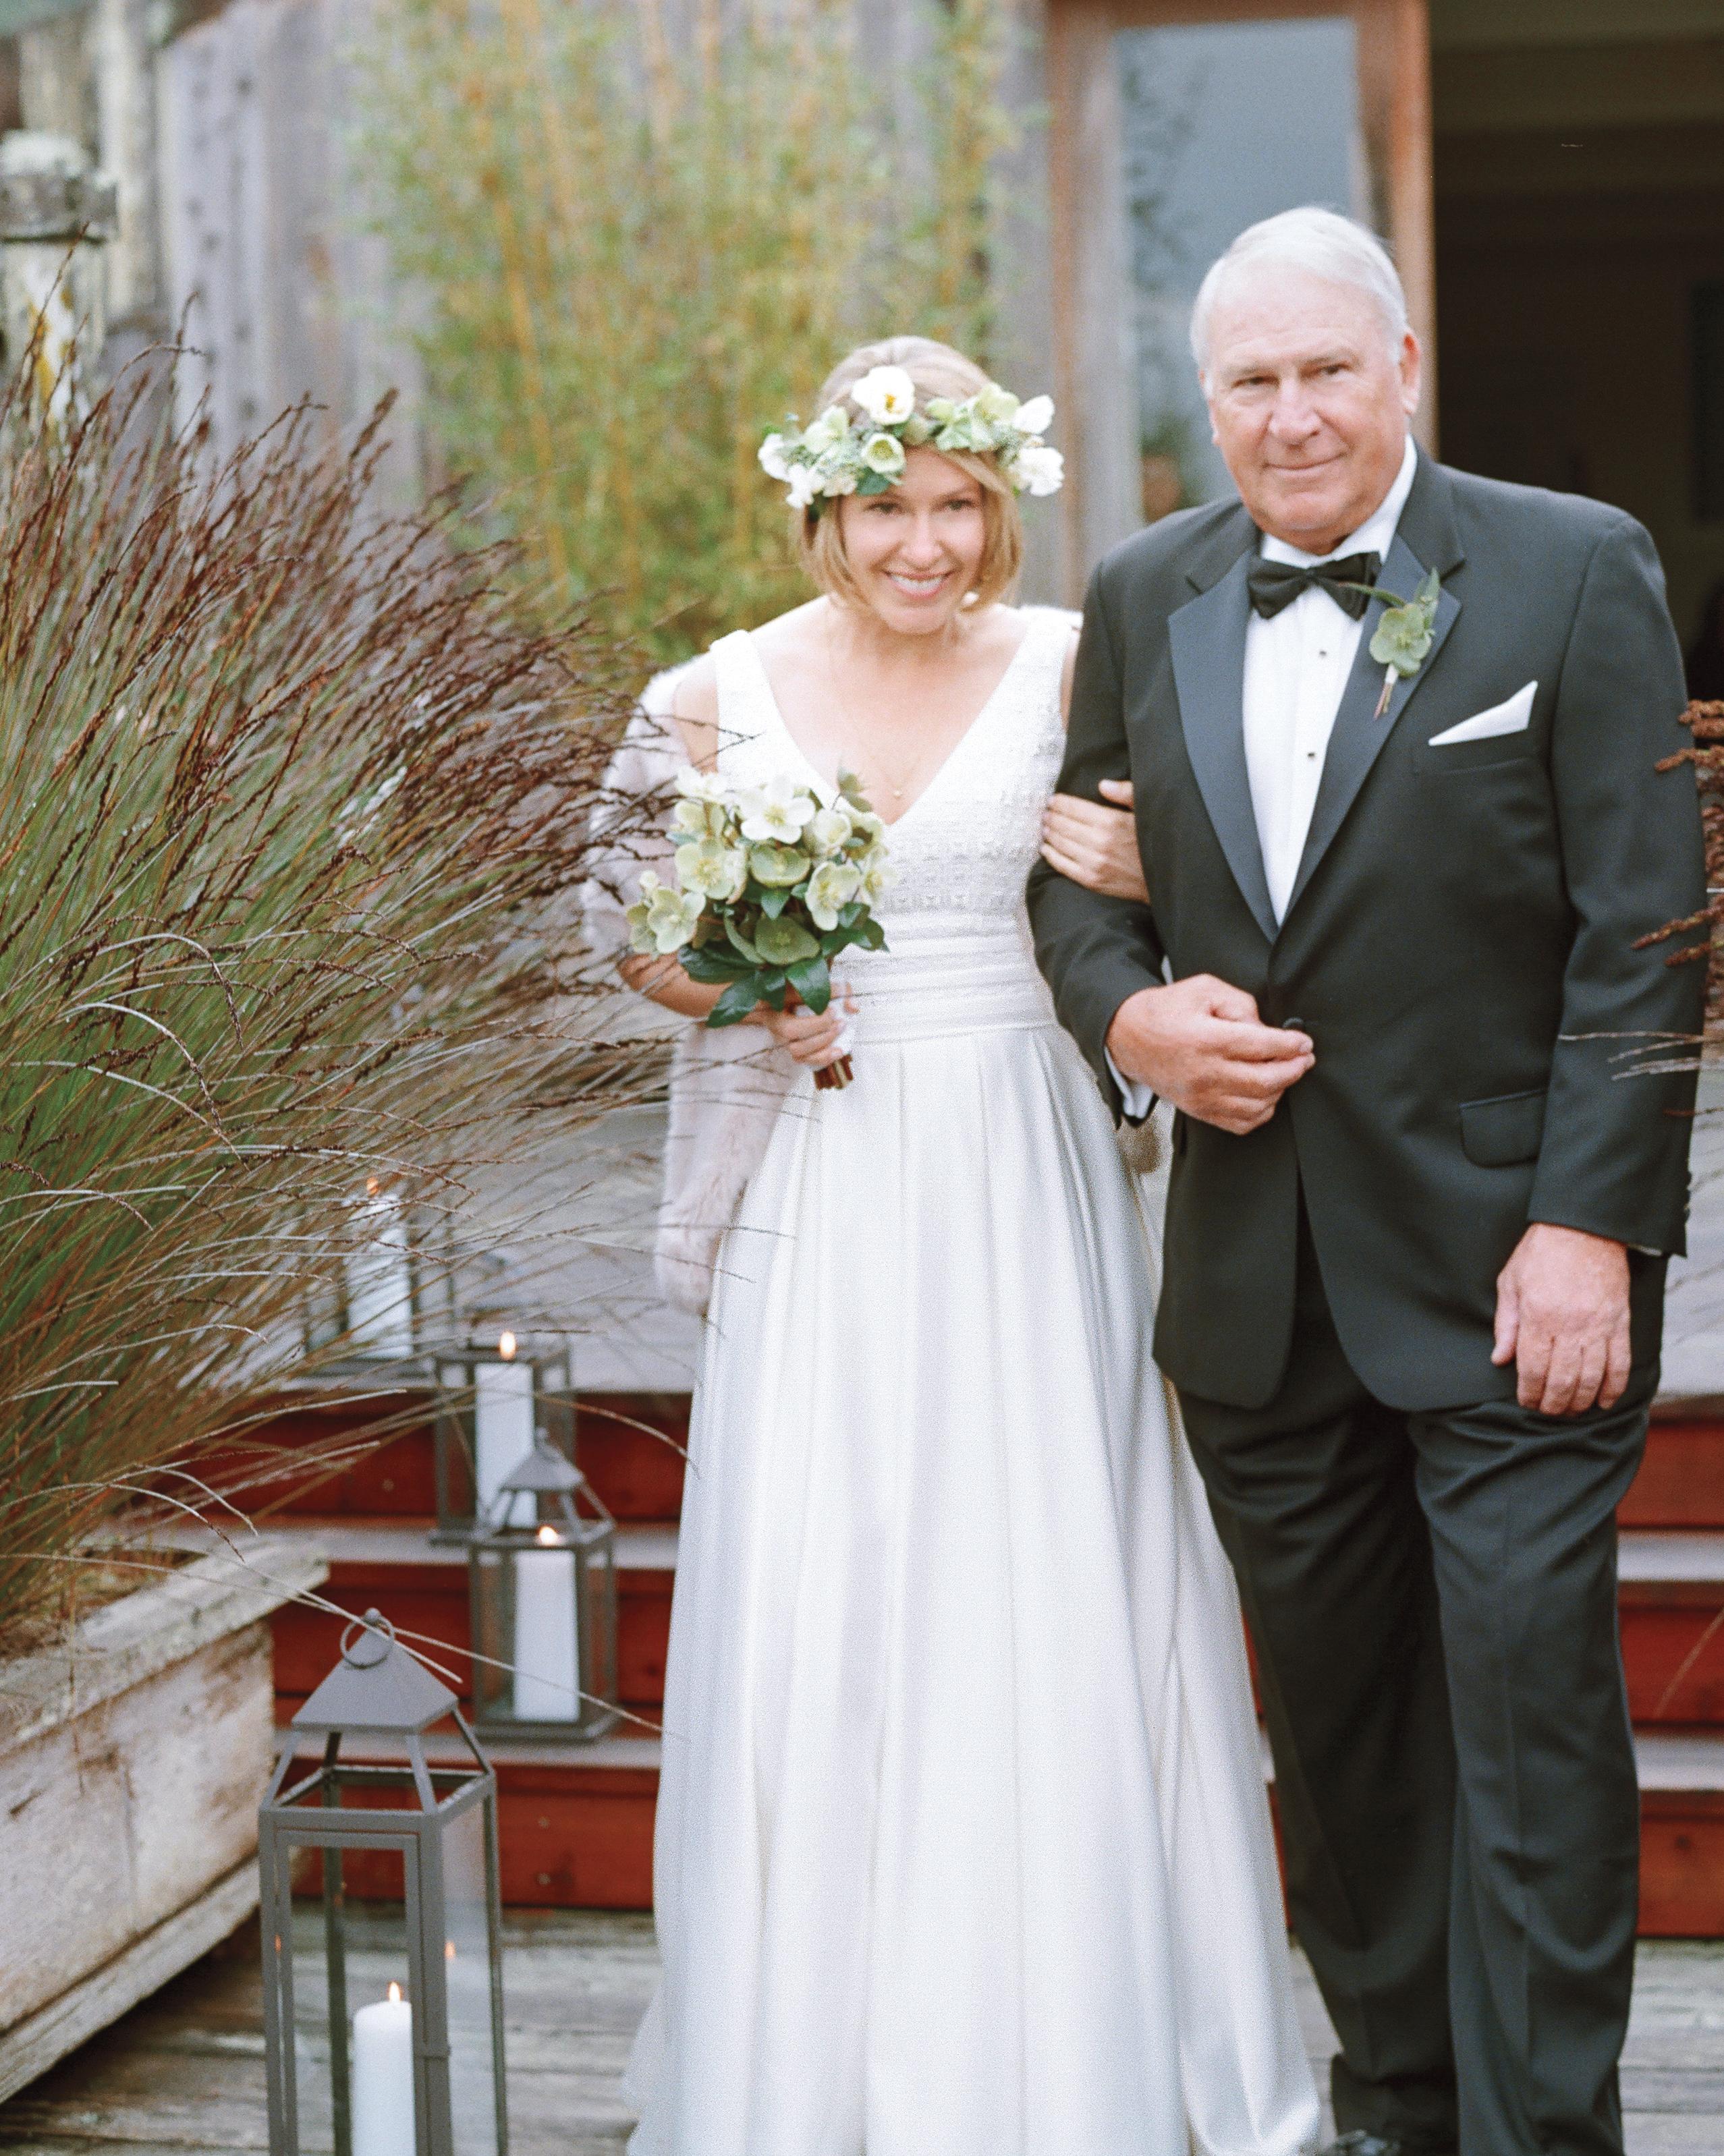 alison-markus-real-wedding-elizabeth-messina-159-ds111251.jpg